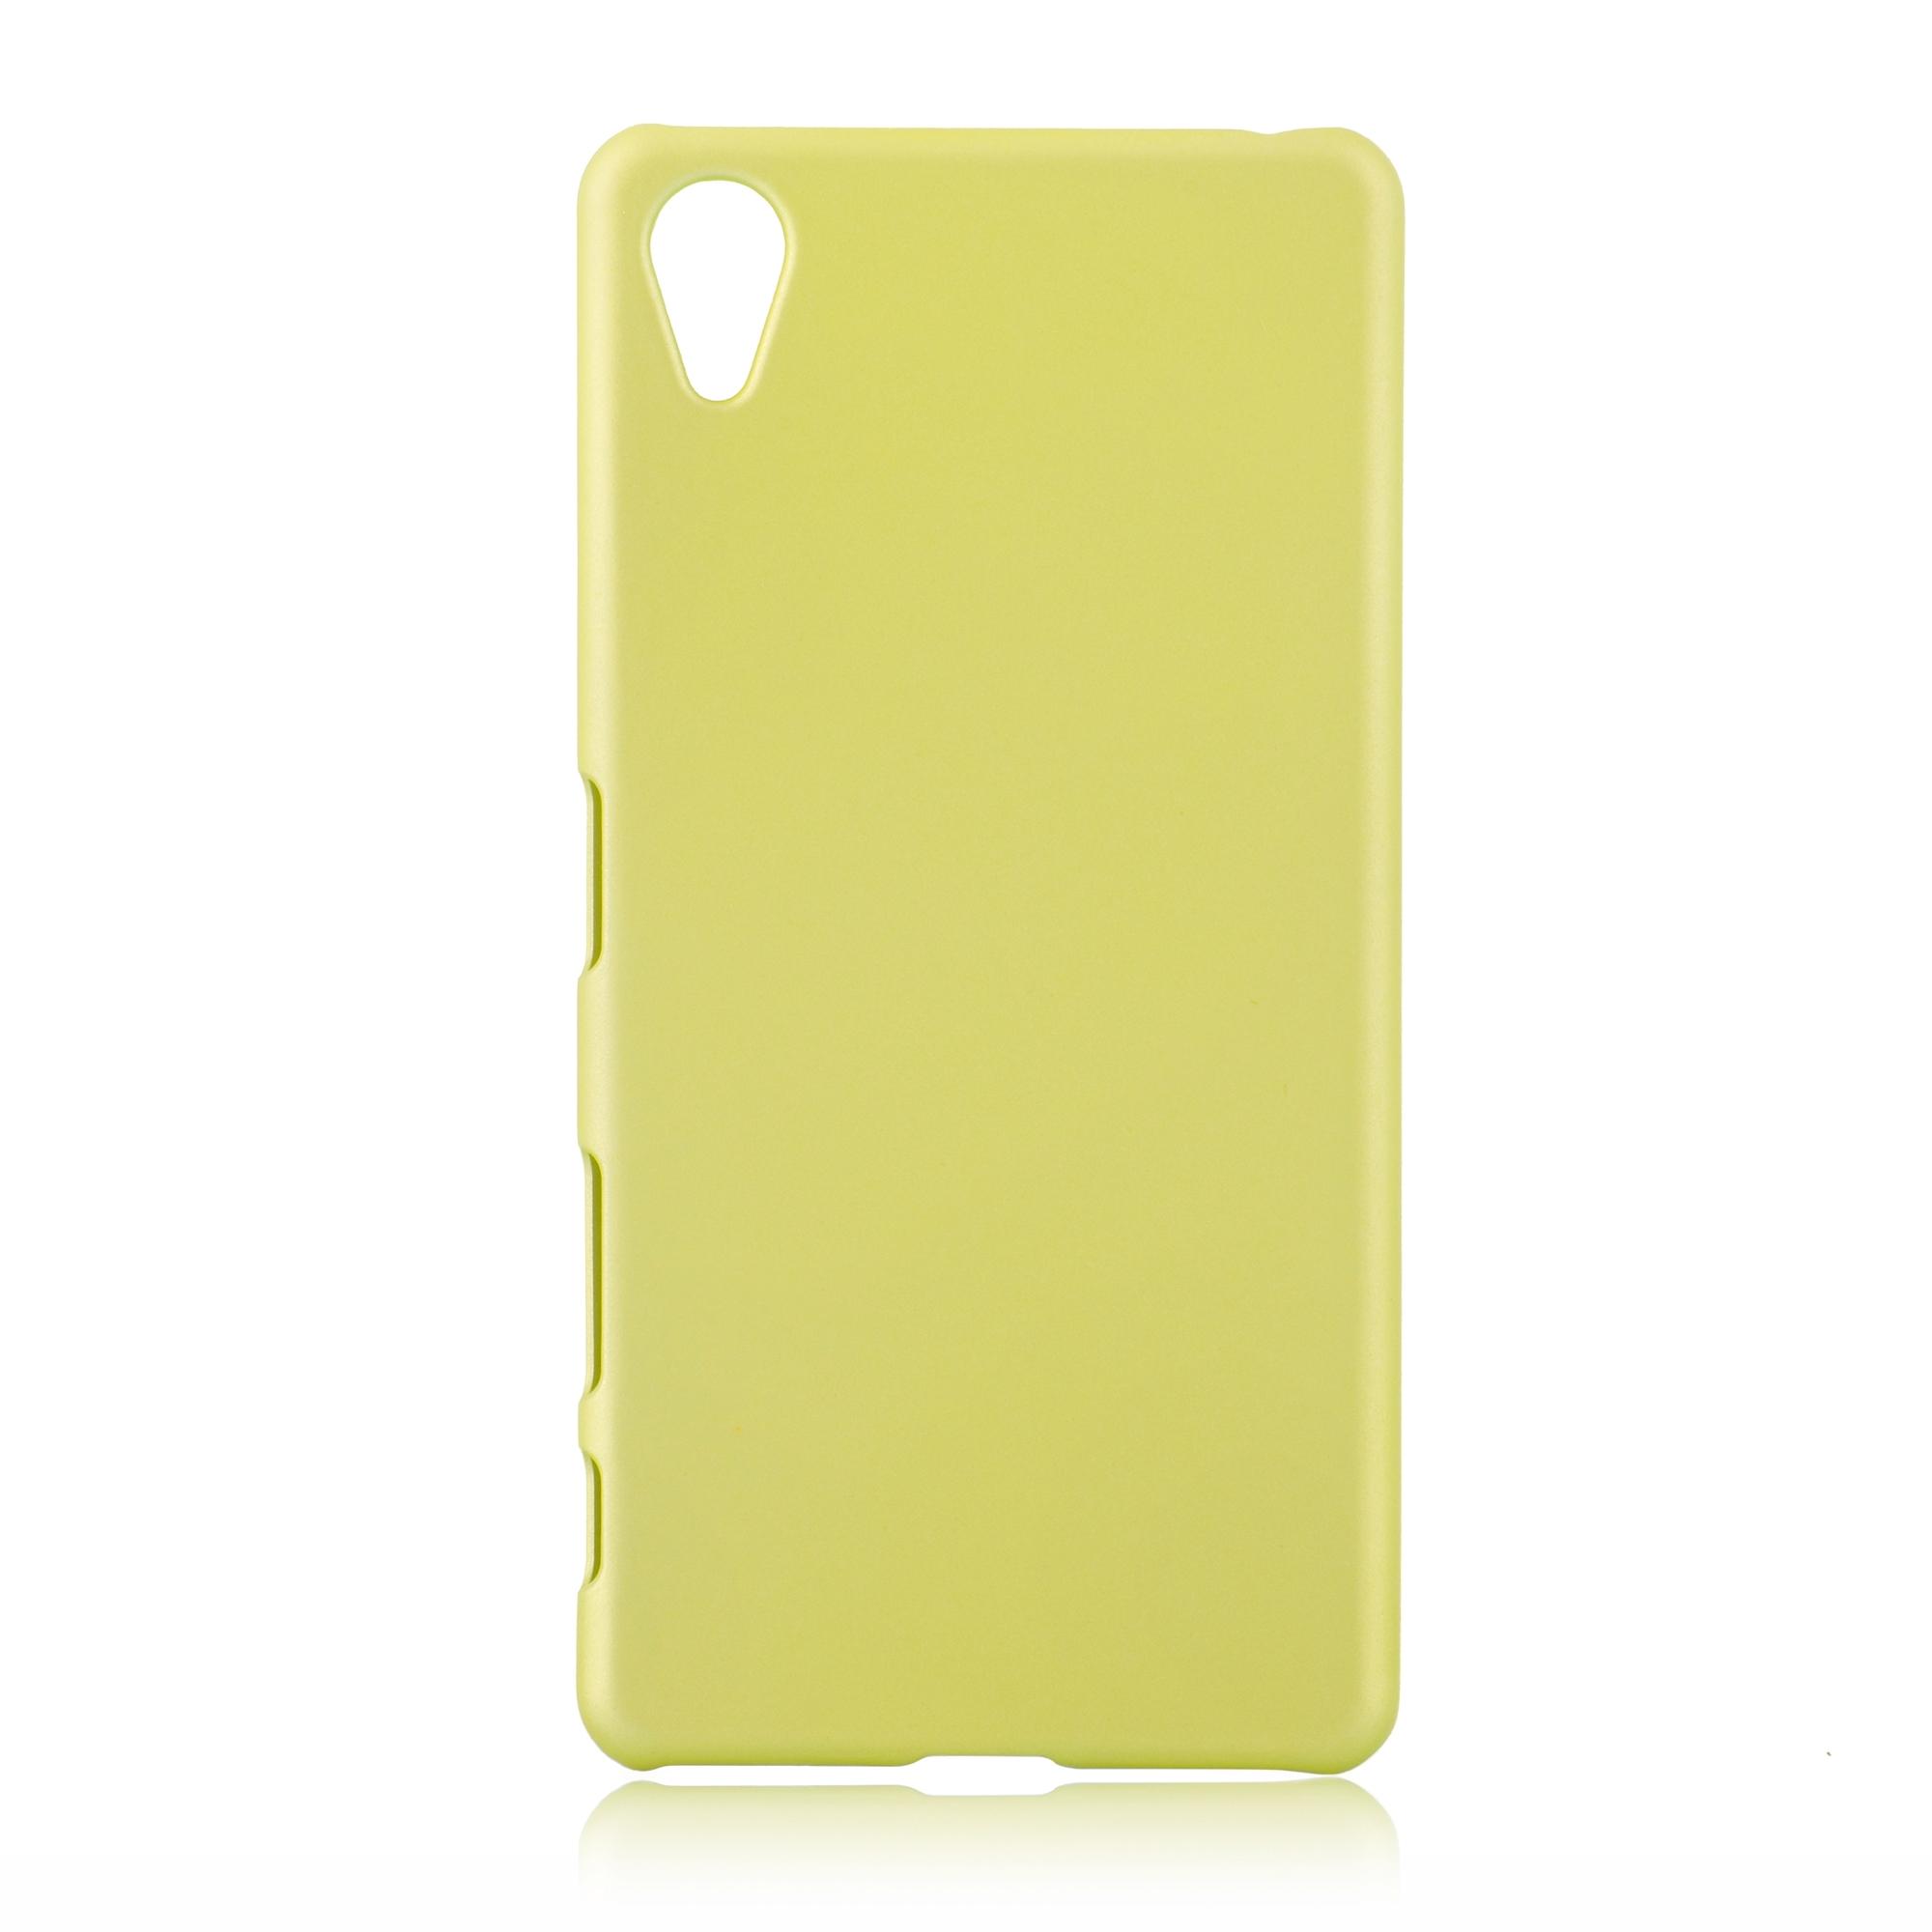 Пластиковая накладка Brosco Soft-touch для Sony Xperia X Perfomance, золотой лайм